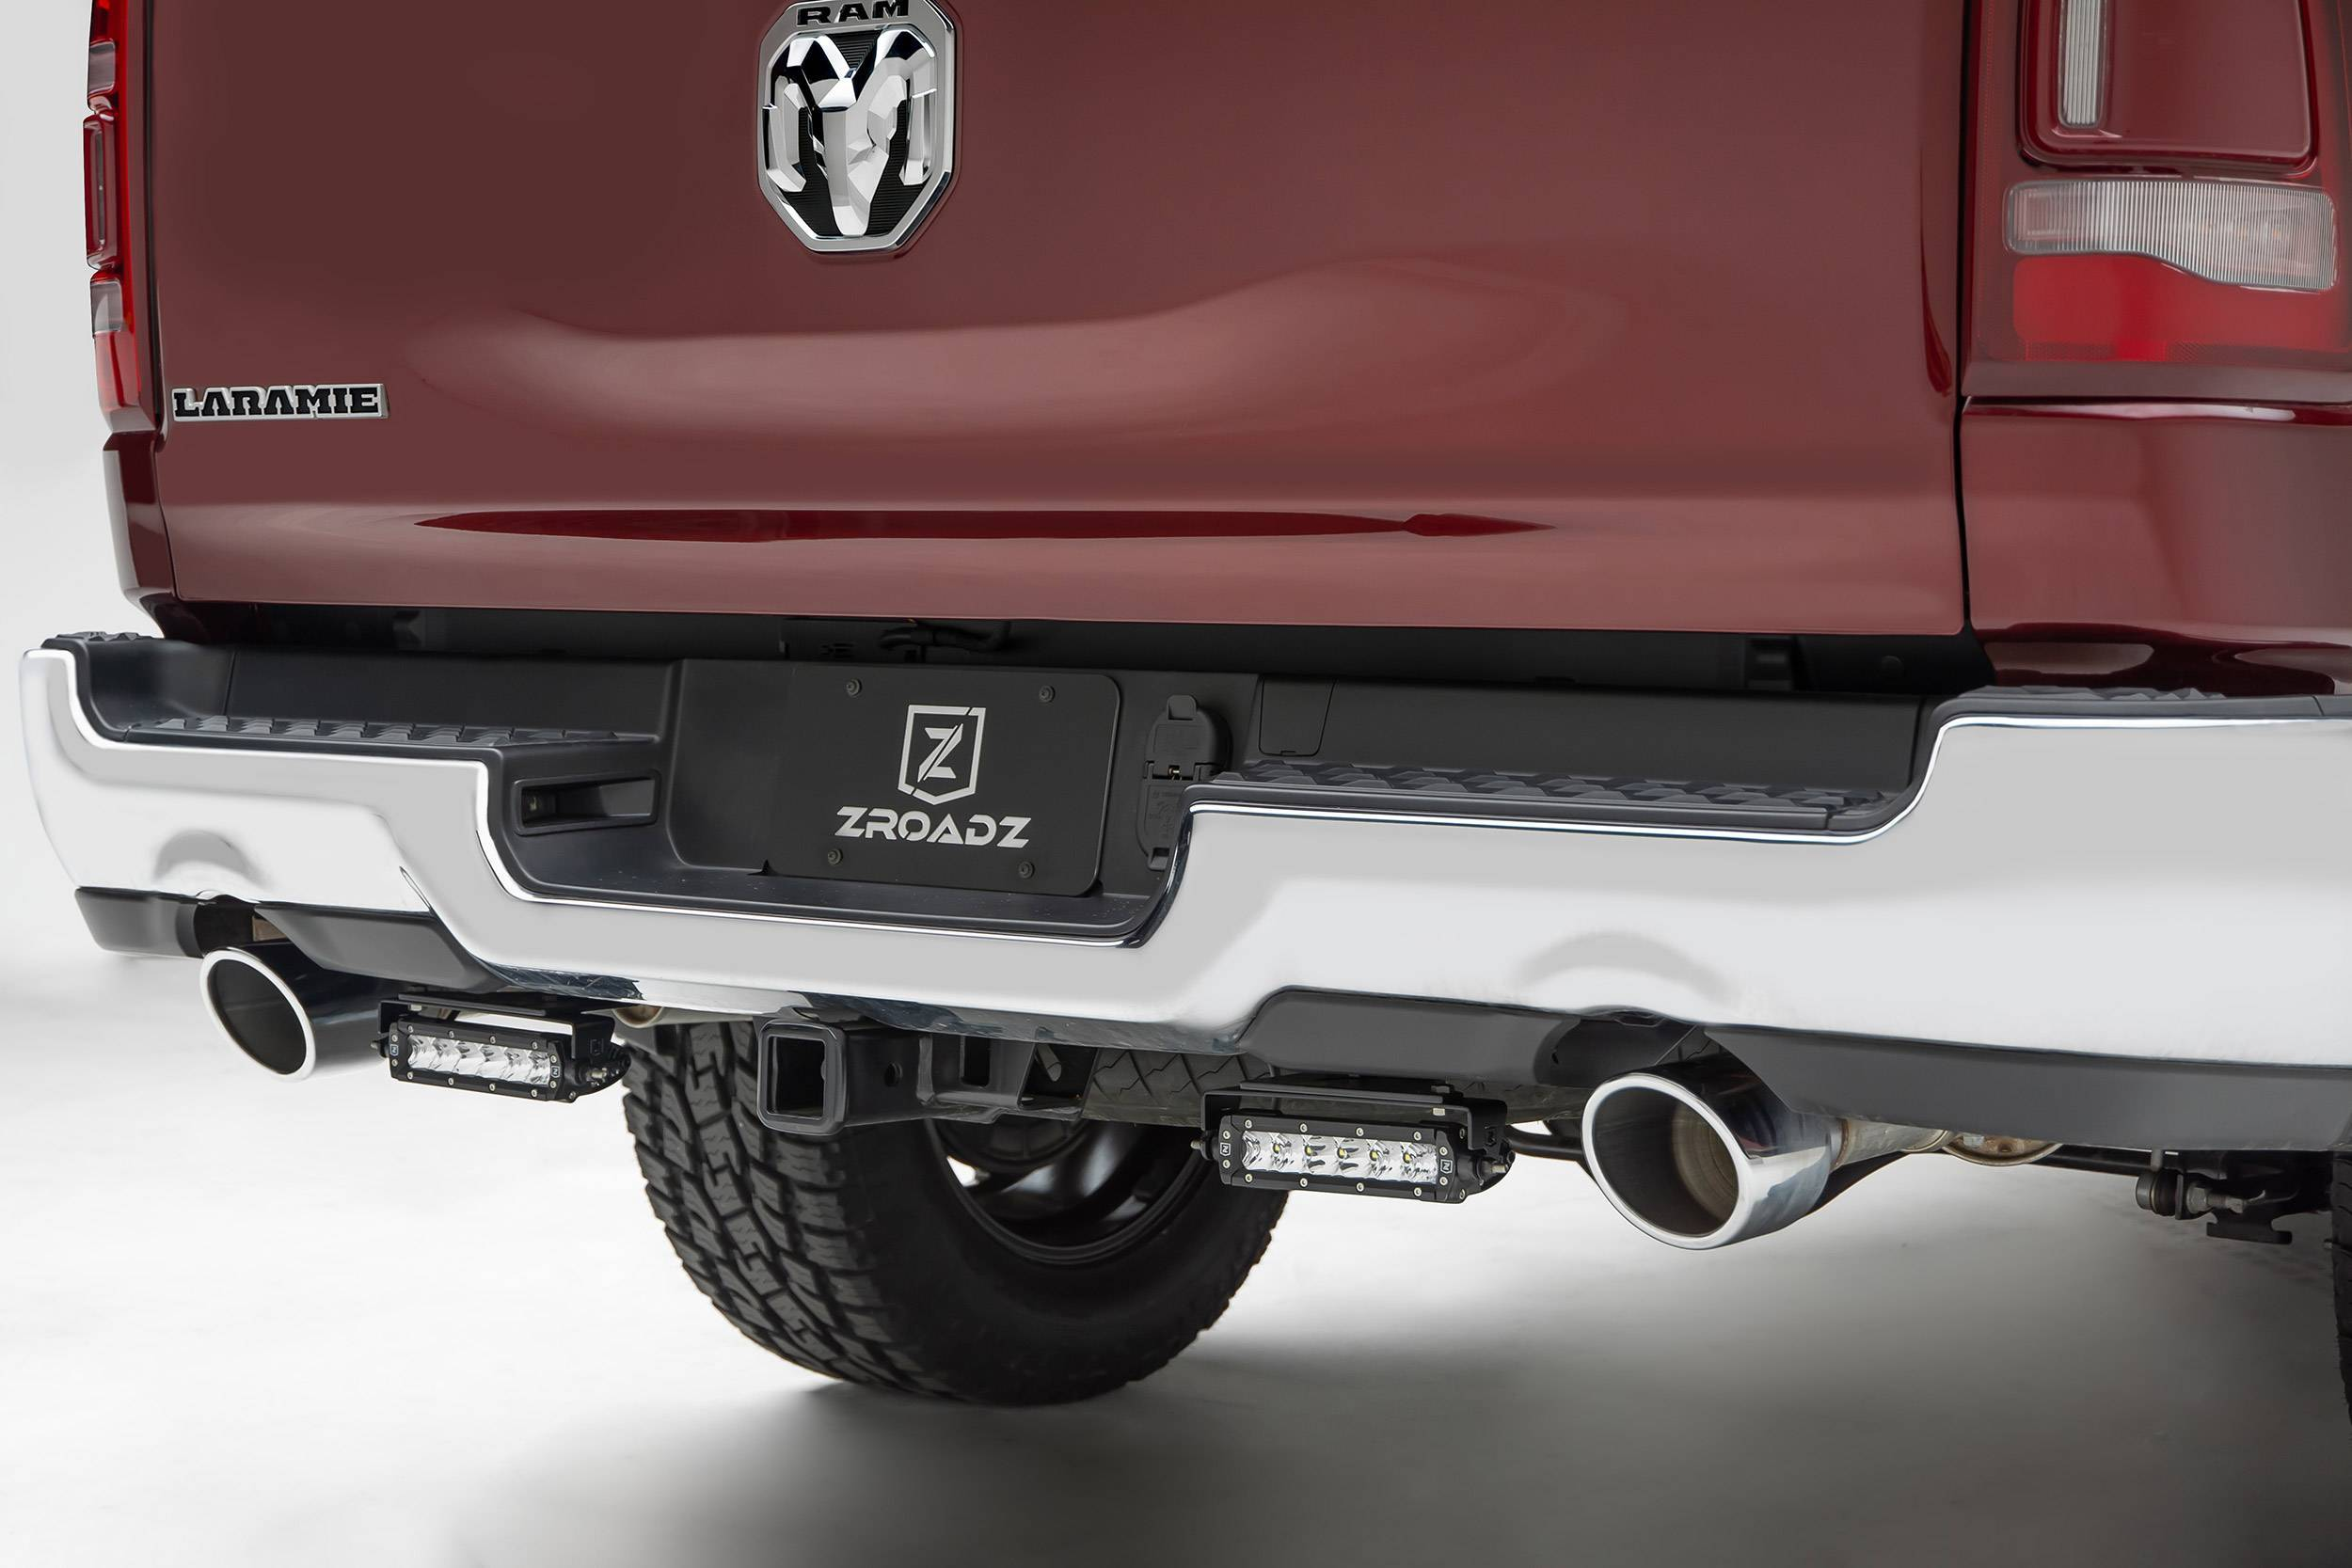 ZROADZ OFF ROAD PRODUCTS - 2019-2021 Ram 1500 Rear Bumper LED Bracket to mount (2) 6 Inch Straight Single Row Light Bar - PN #Z384821